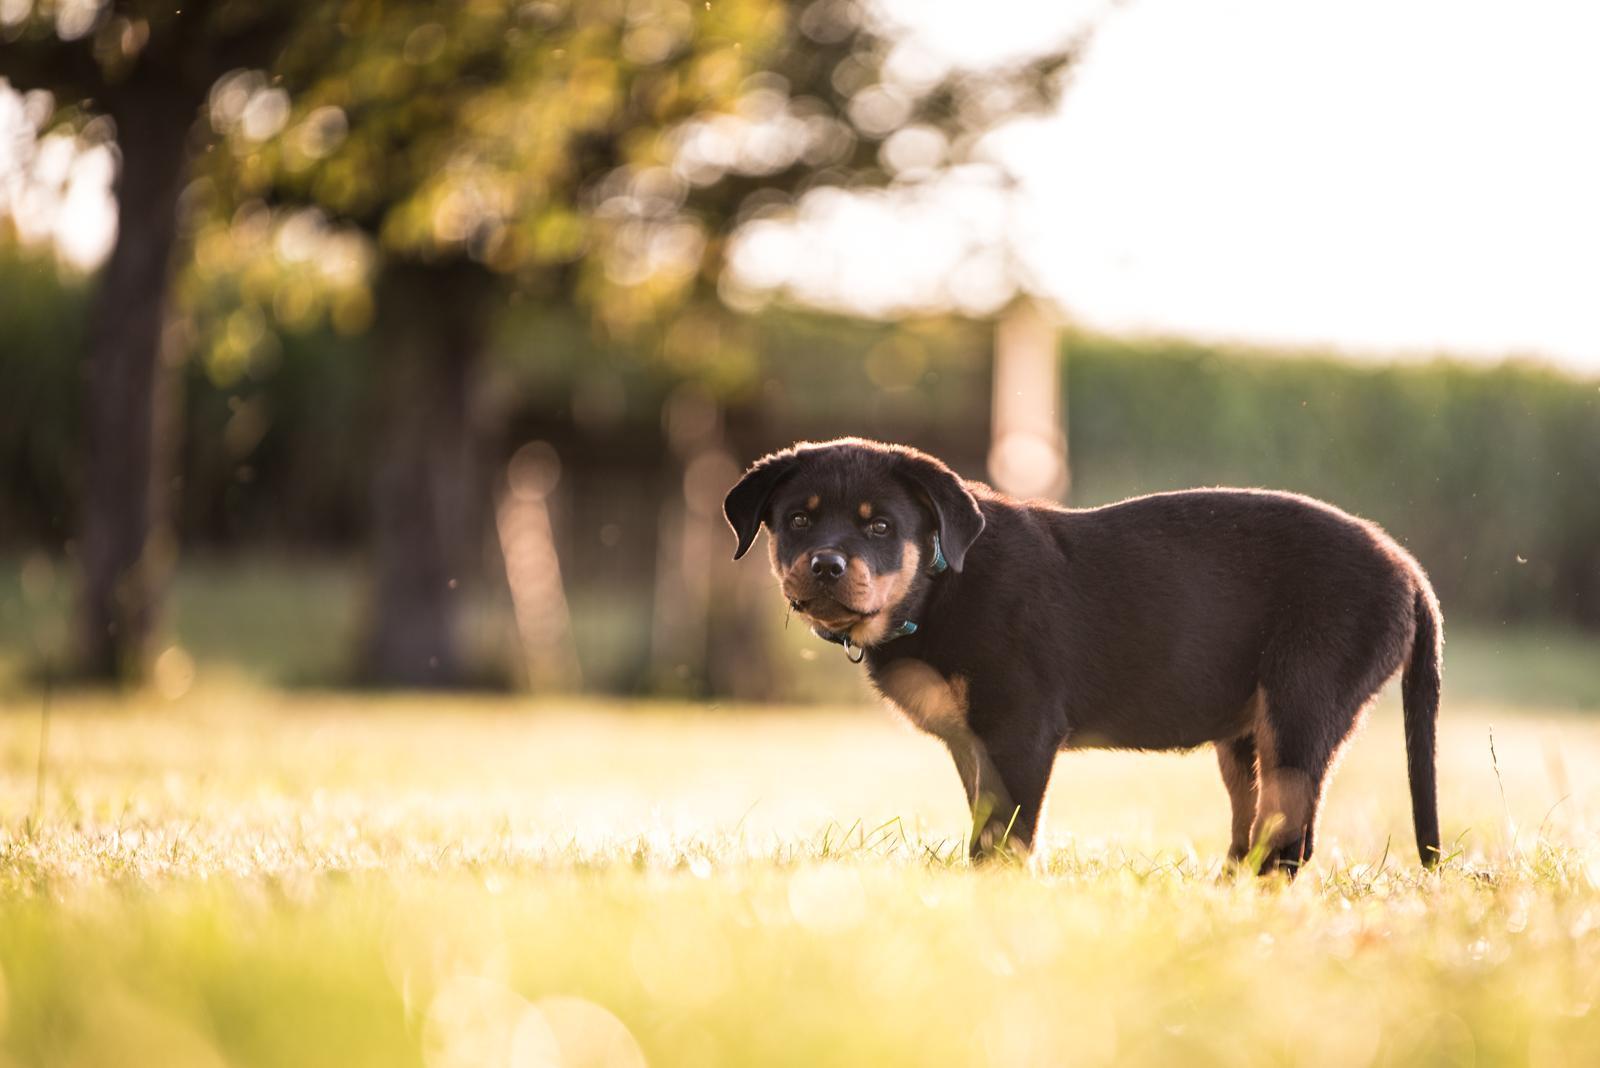 Tierfotograf-Labrador-Sven's Bildwerke-Hund-Hundefotografie6